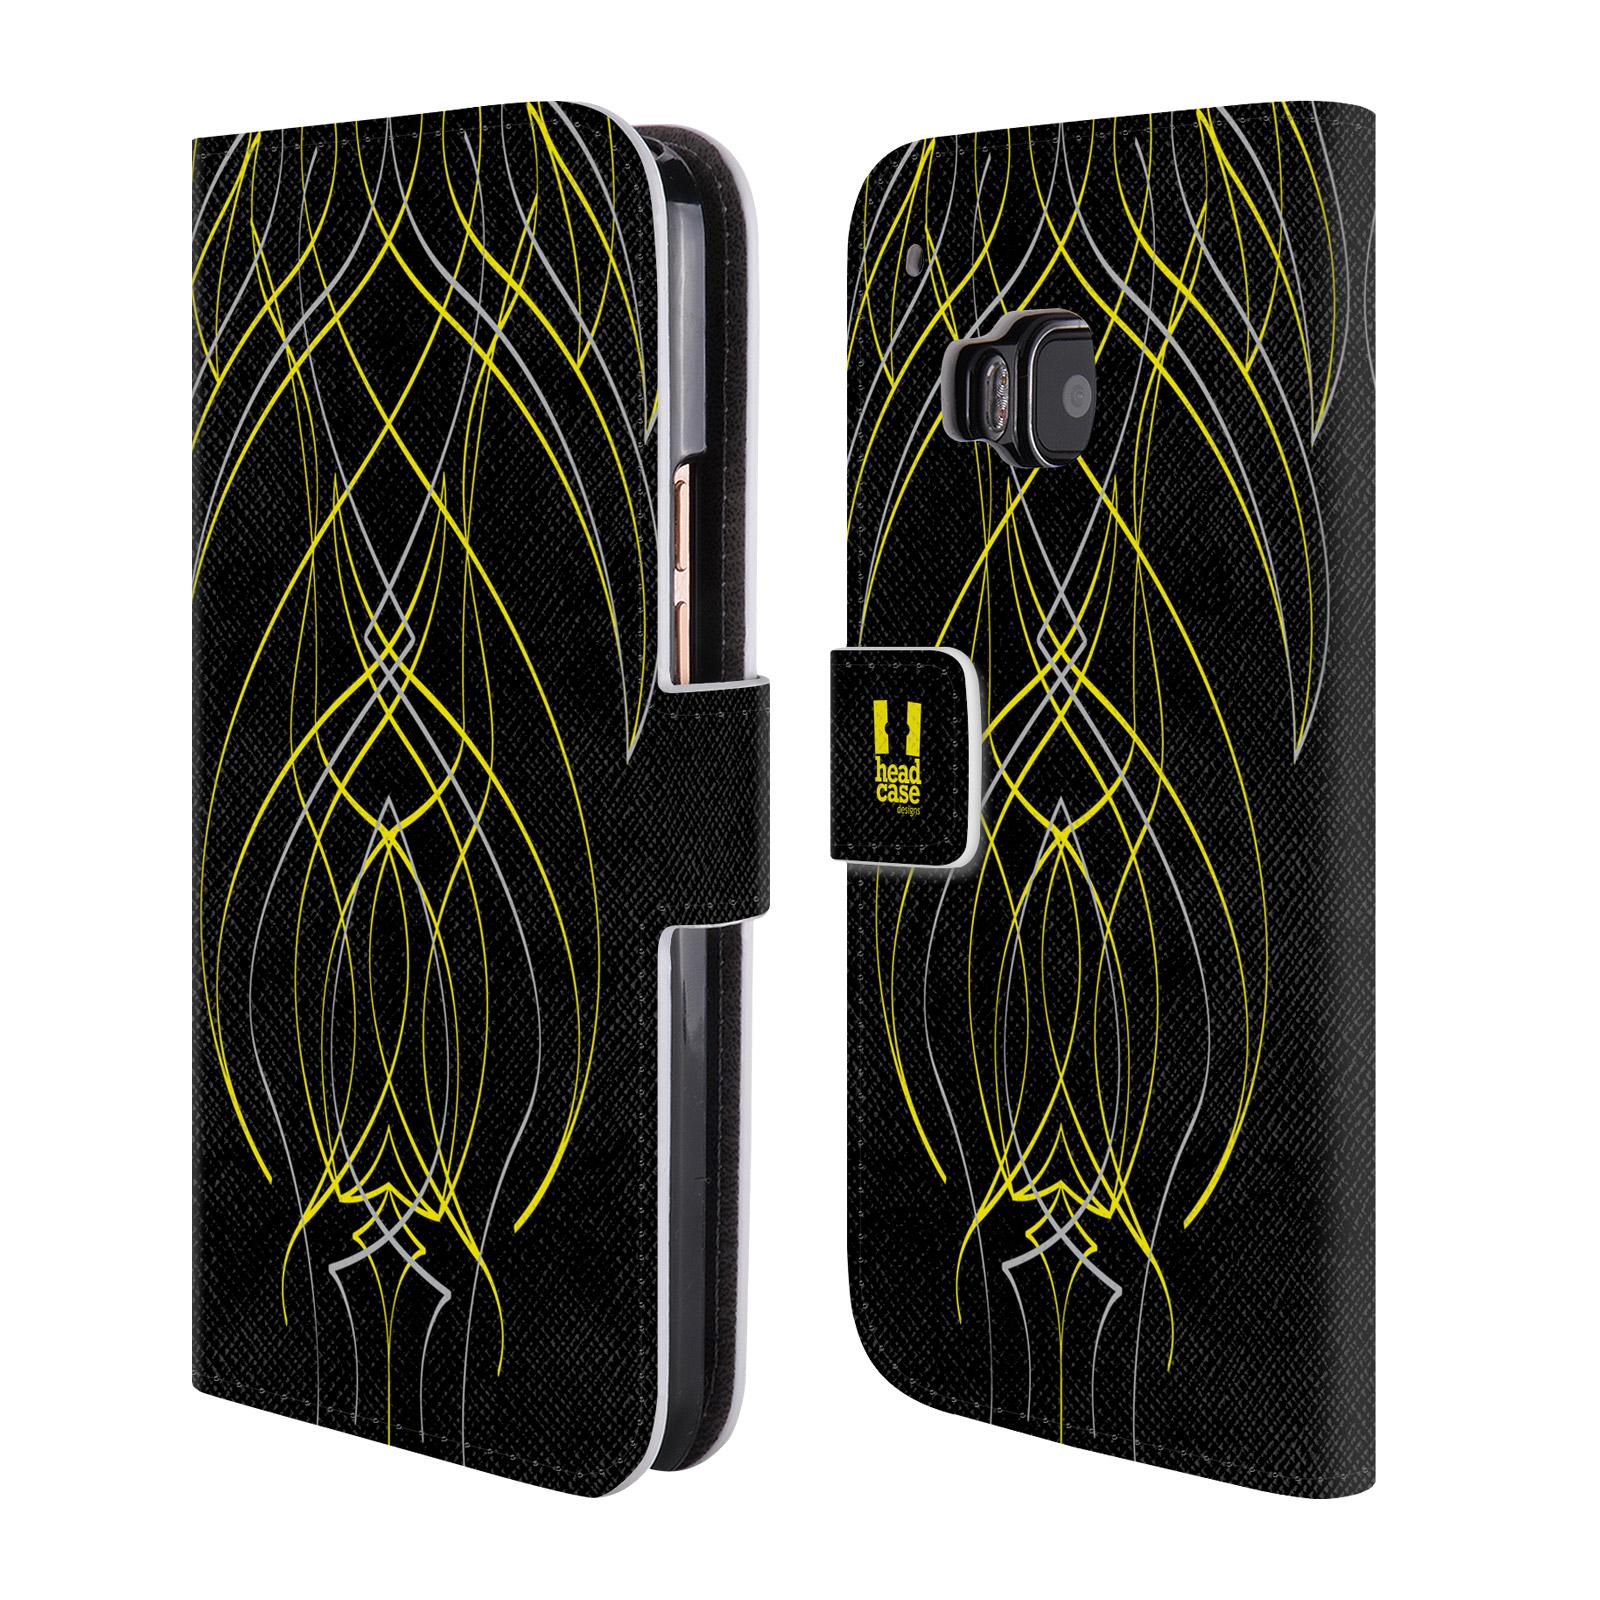 head case nadelmuster design brieftasche handyh lle aus. Black Bedroom Furniture Sets. Home Design Ideas